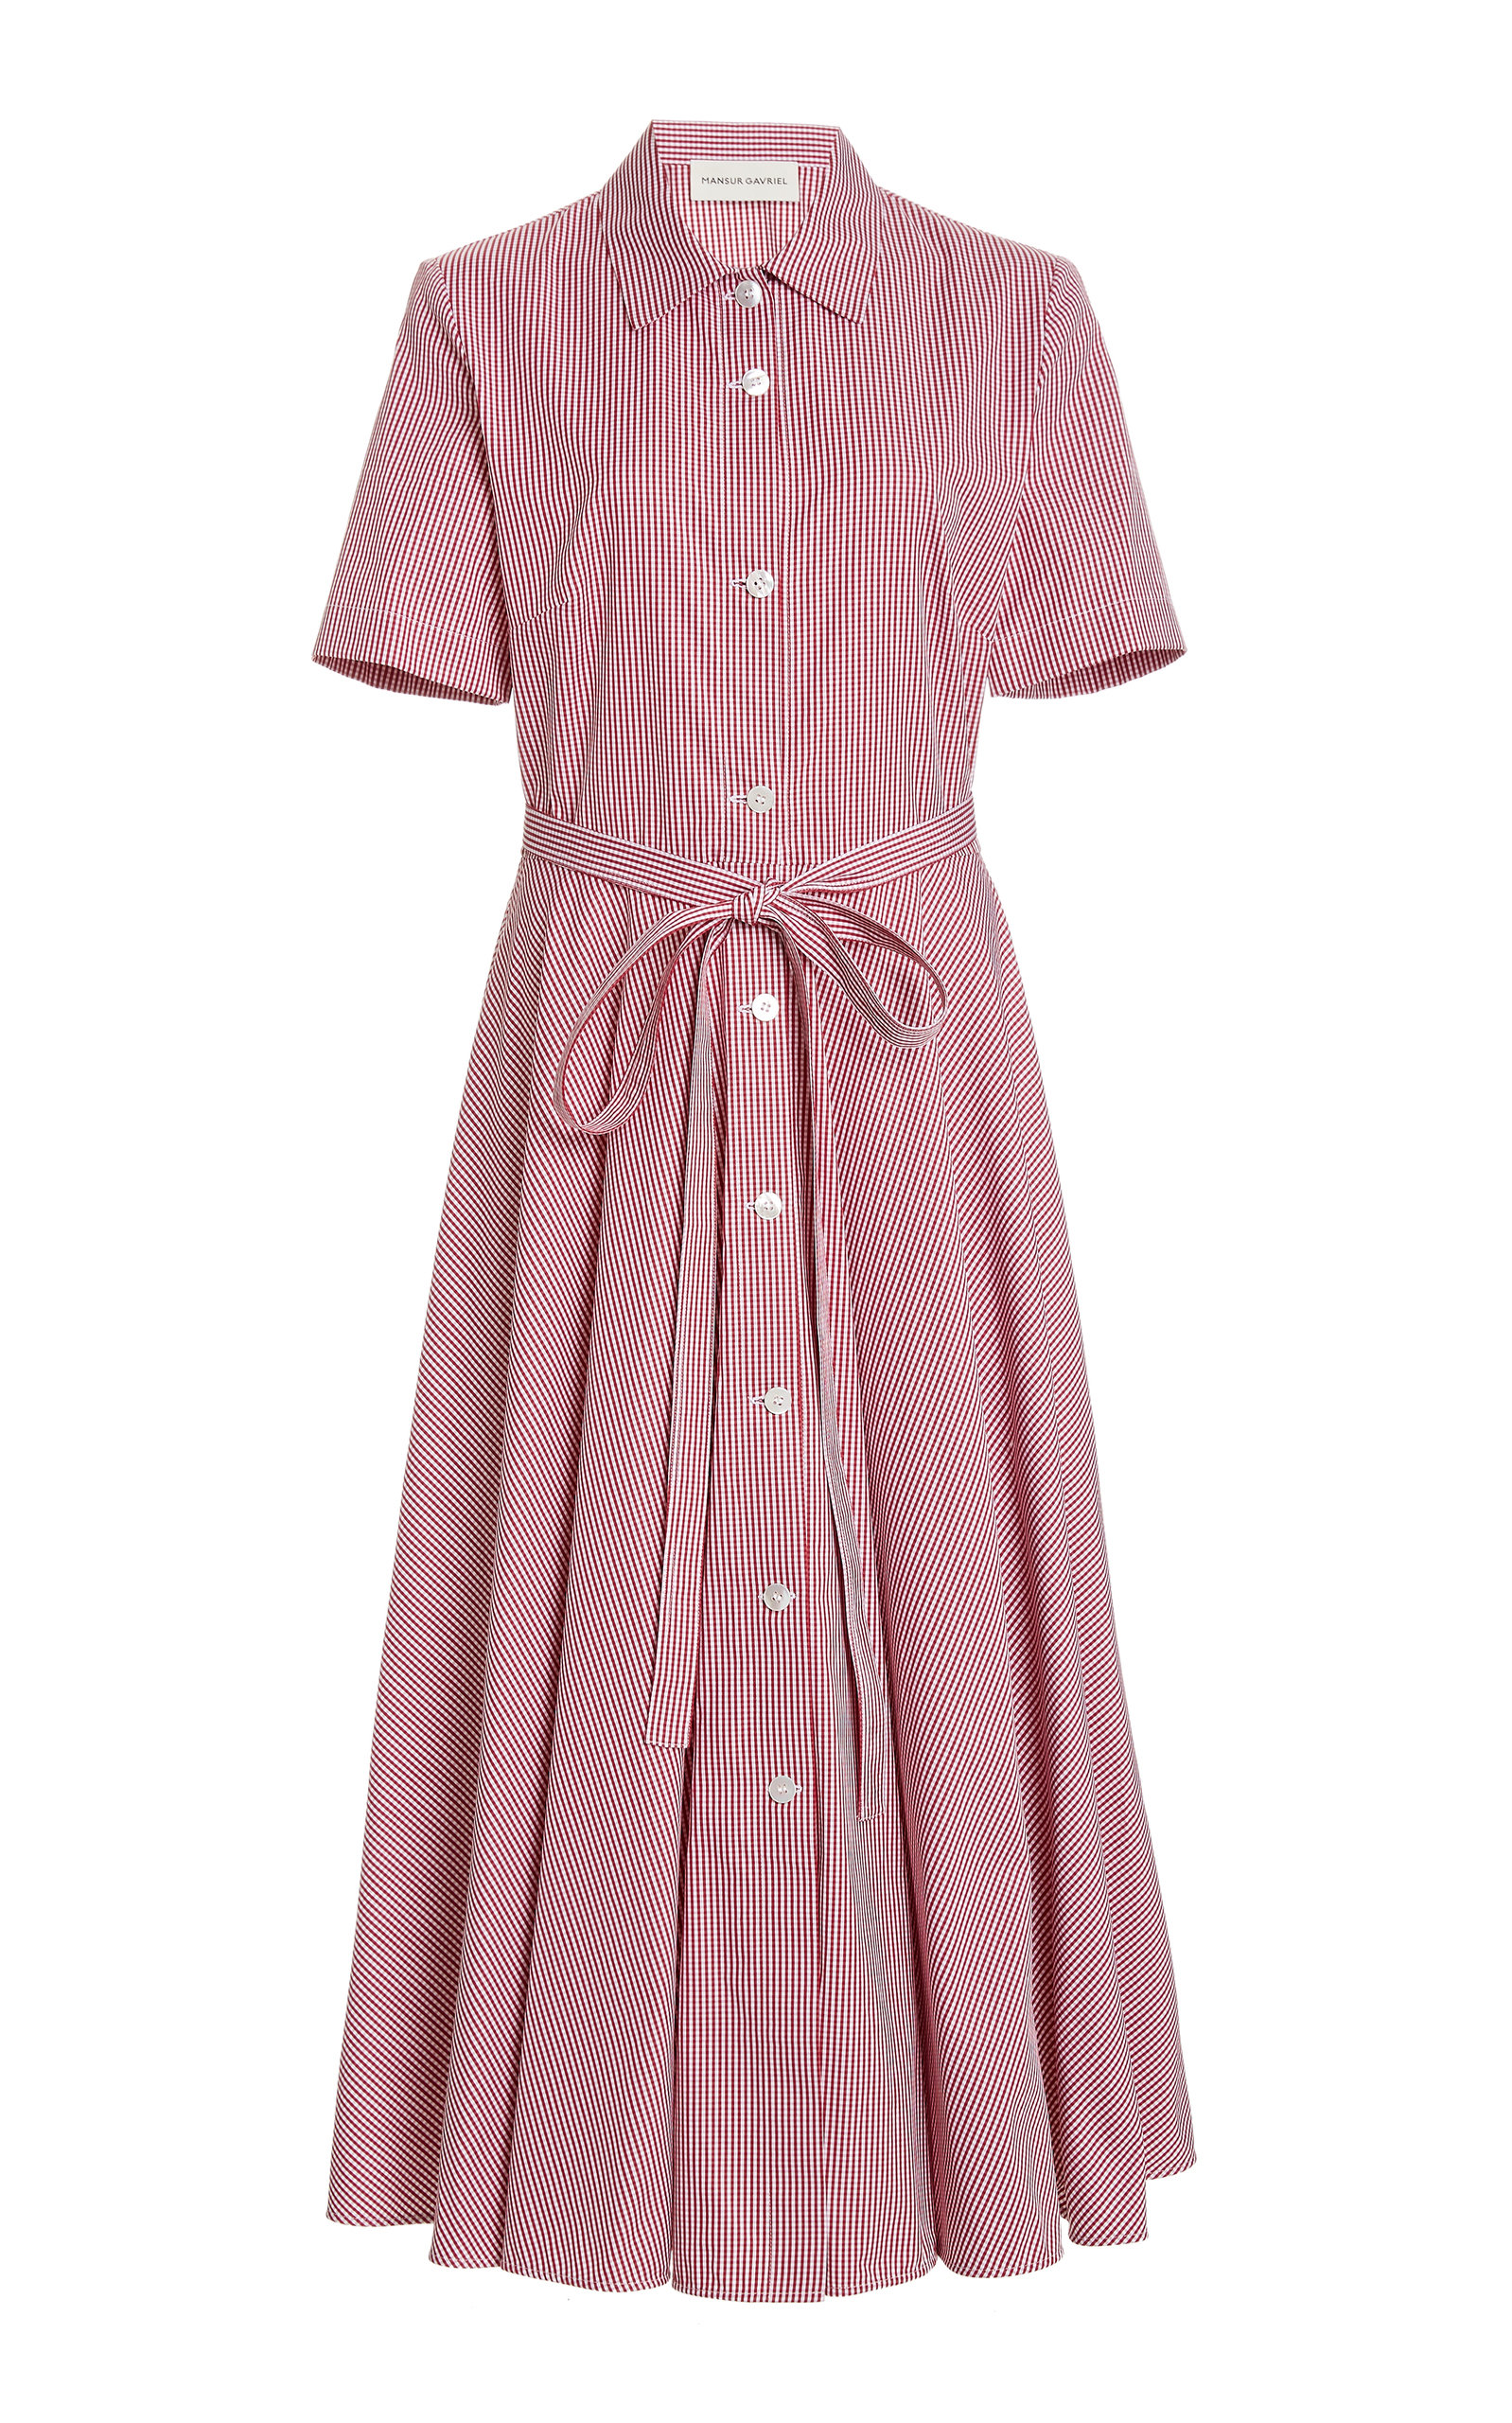 Buy Mansur Gavriel Gingham Cotton Shirt Dress online, shop Mansur Gavriel at the best price